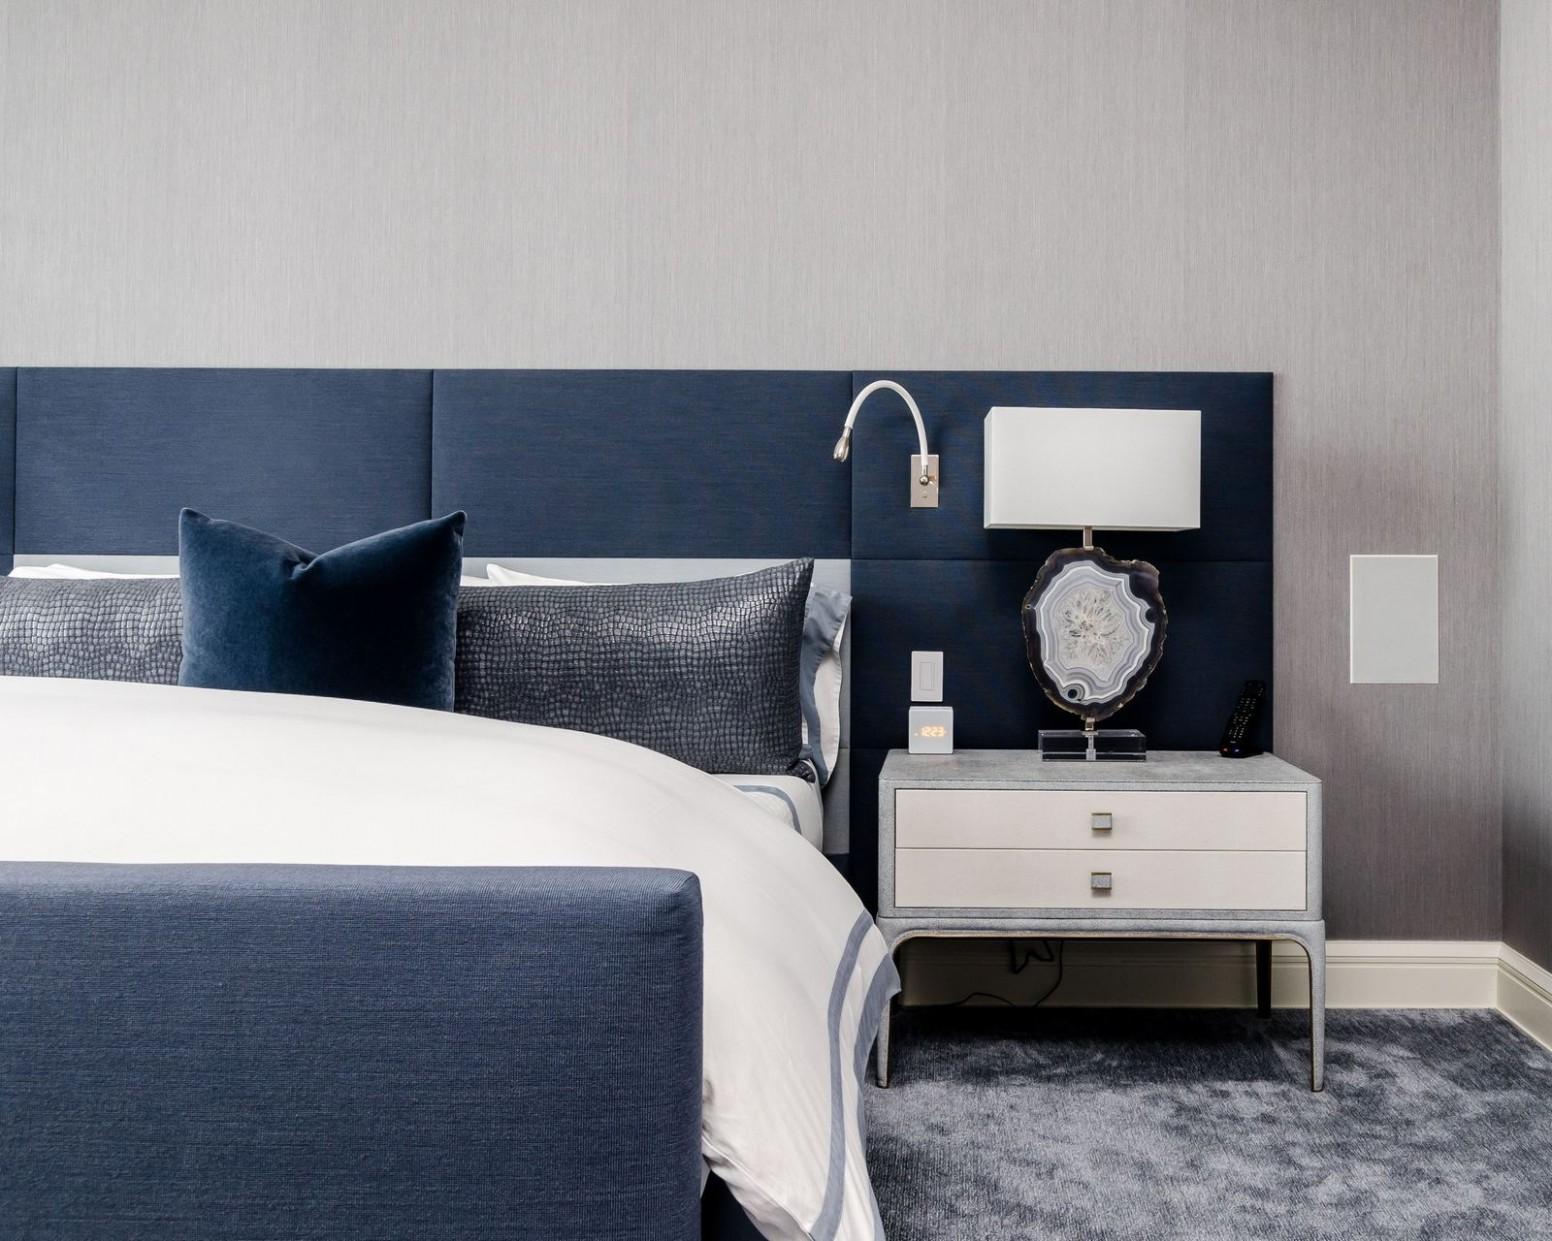 10 Bedroom Ideas - Decorating Tips To Get The Best Sleep  - Bedroom Ideas Uk